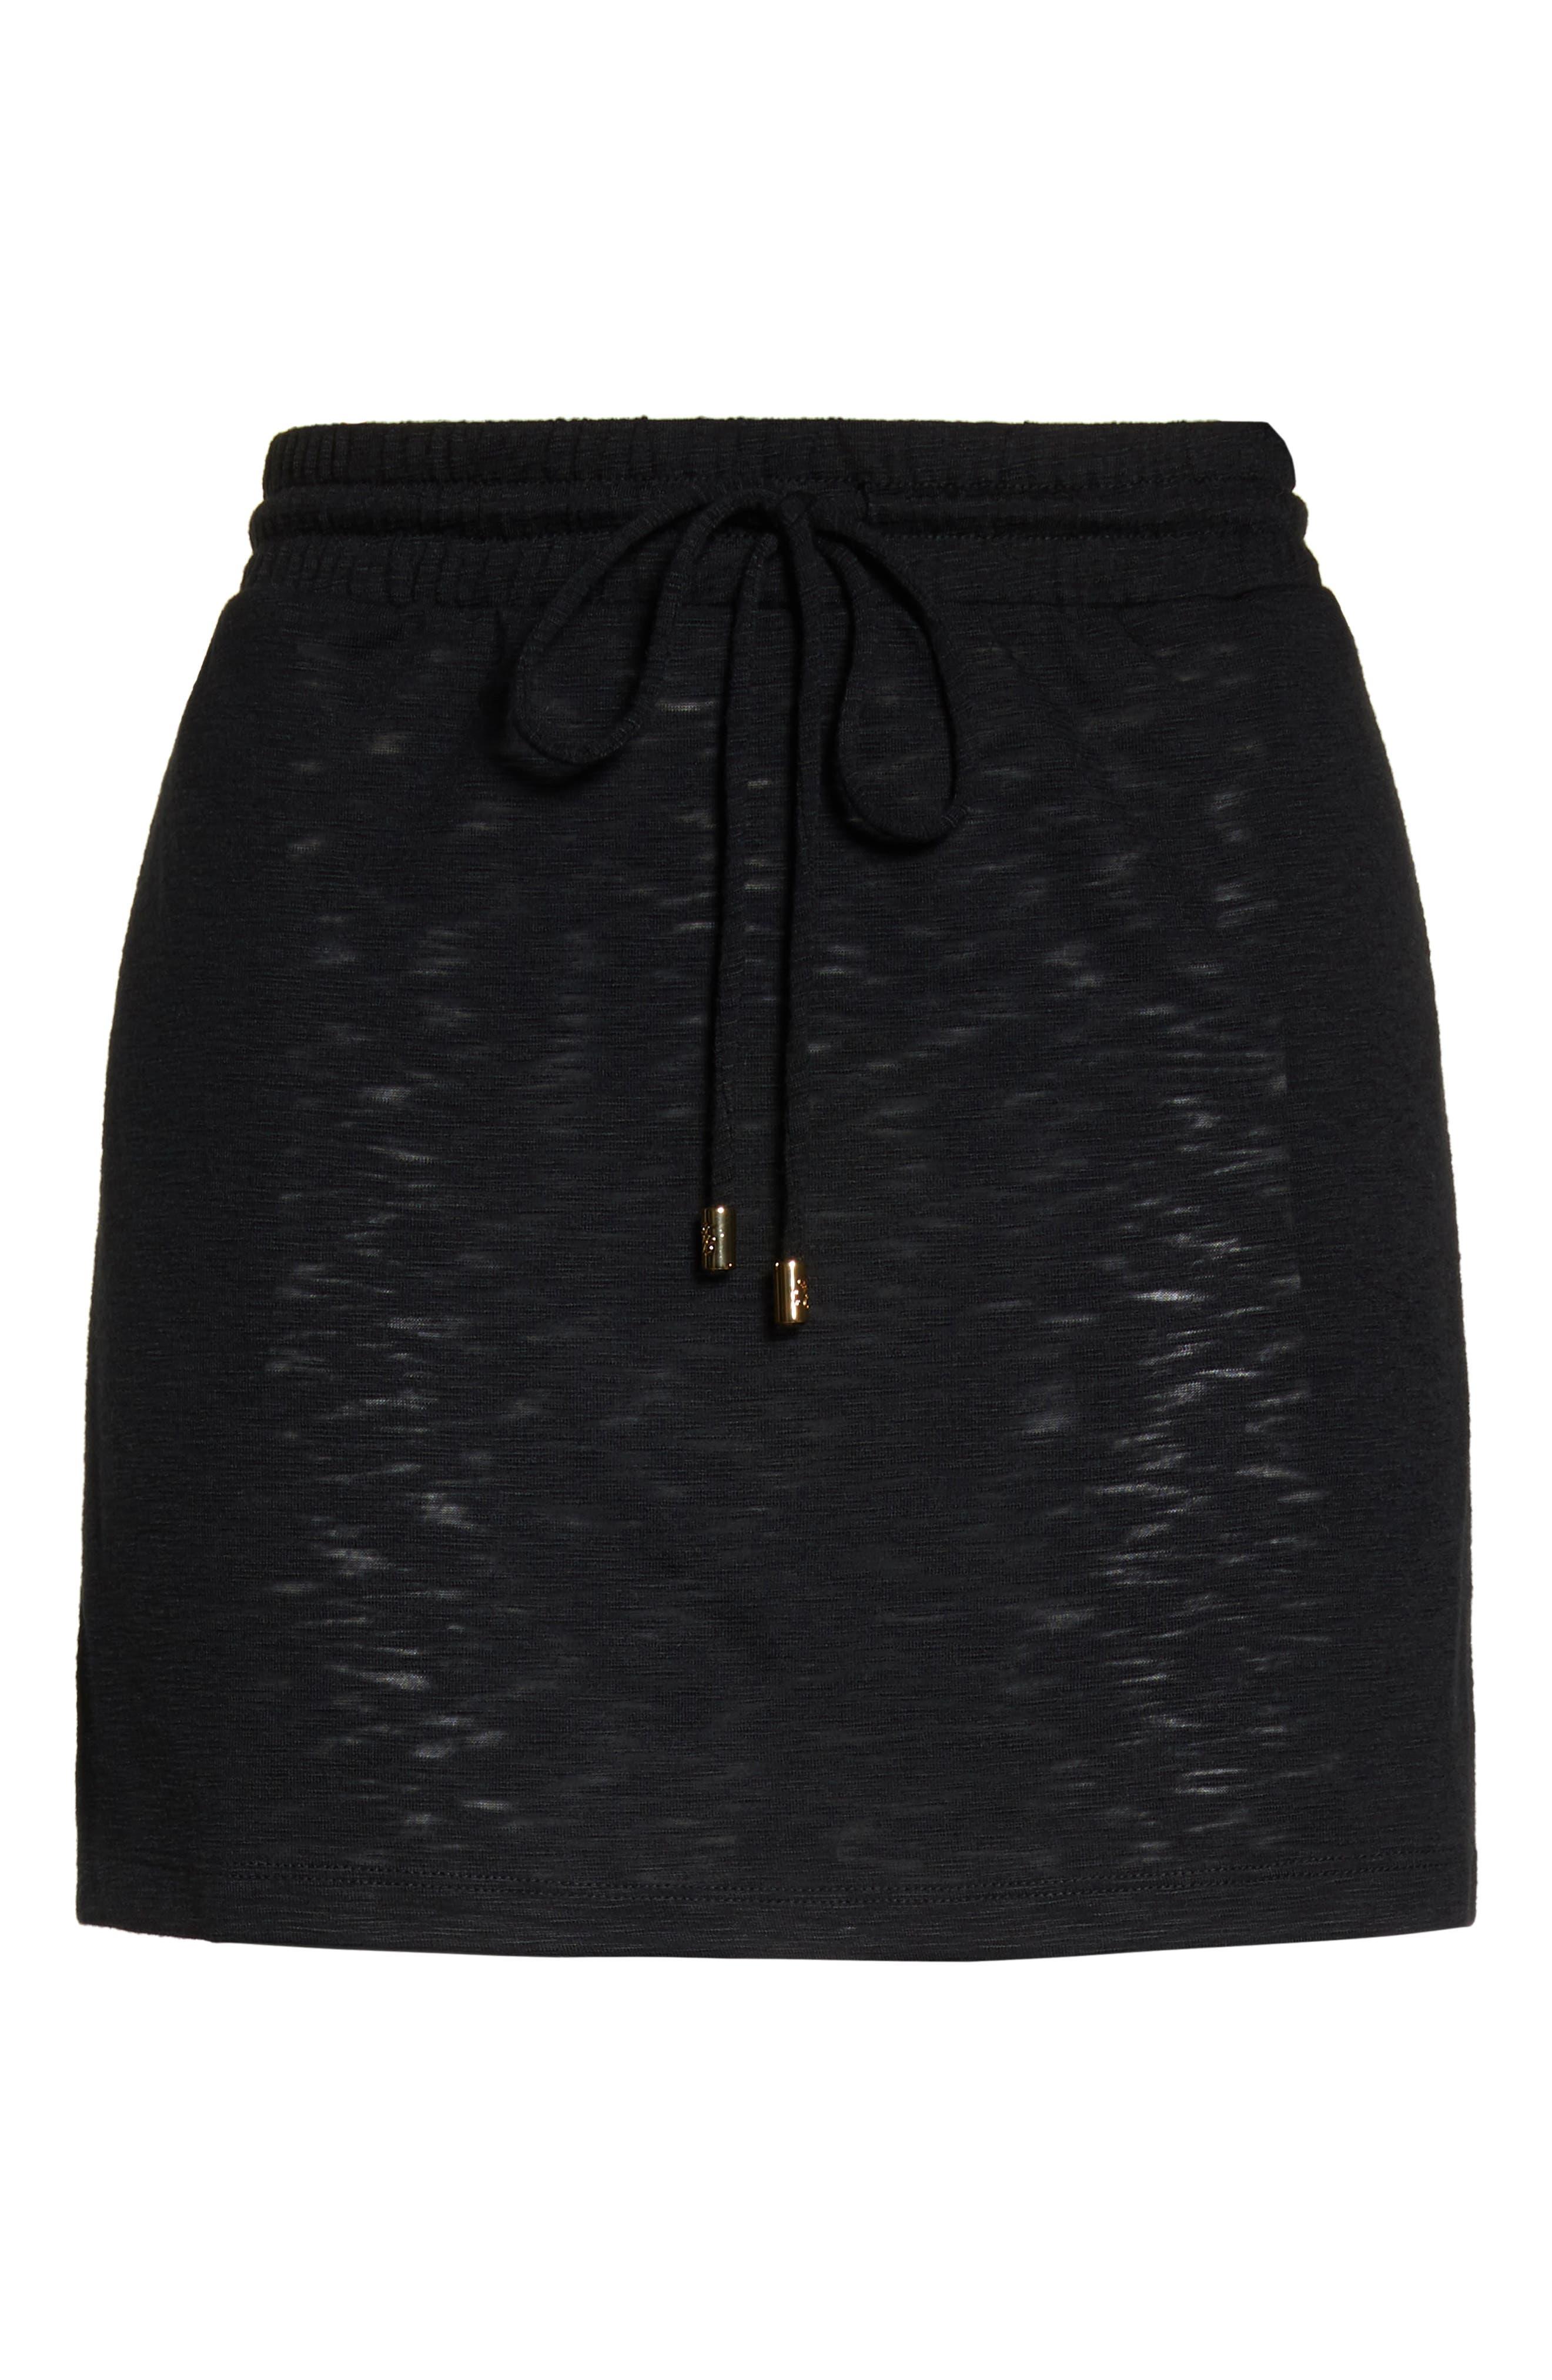 TOMMY BAHAMA,                             Cover-Up Skirt,                             Alternate thumbnail 6, color,                             BLACK